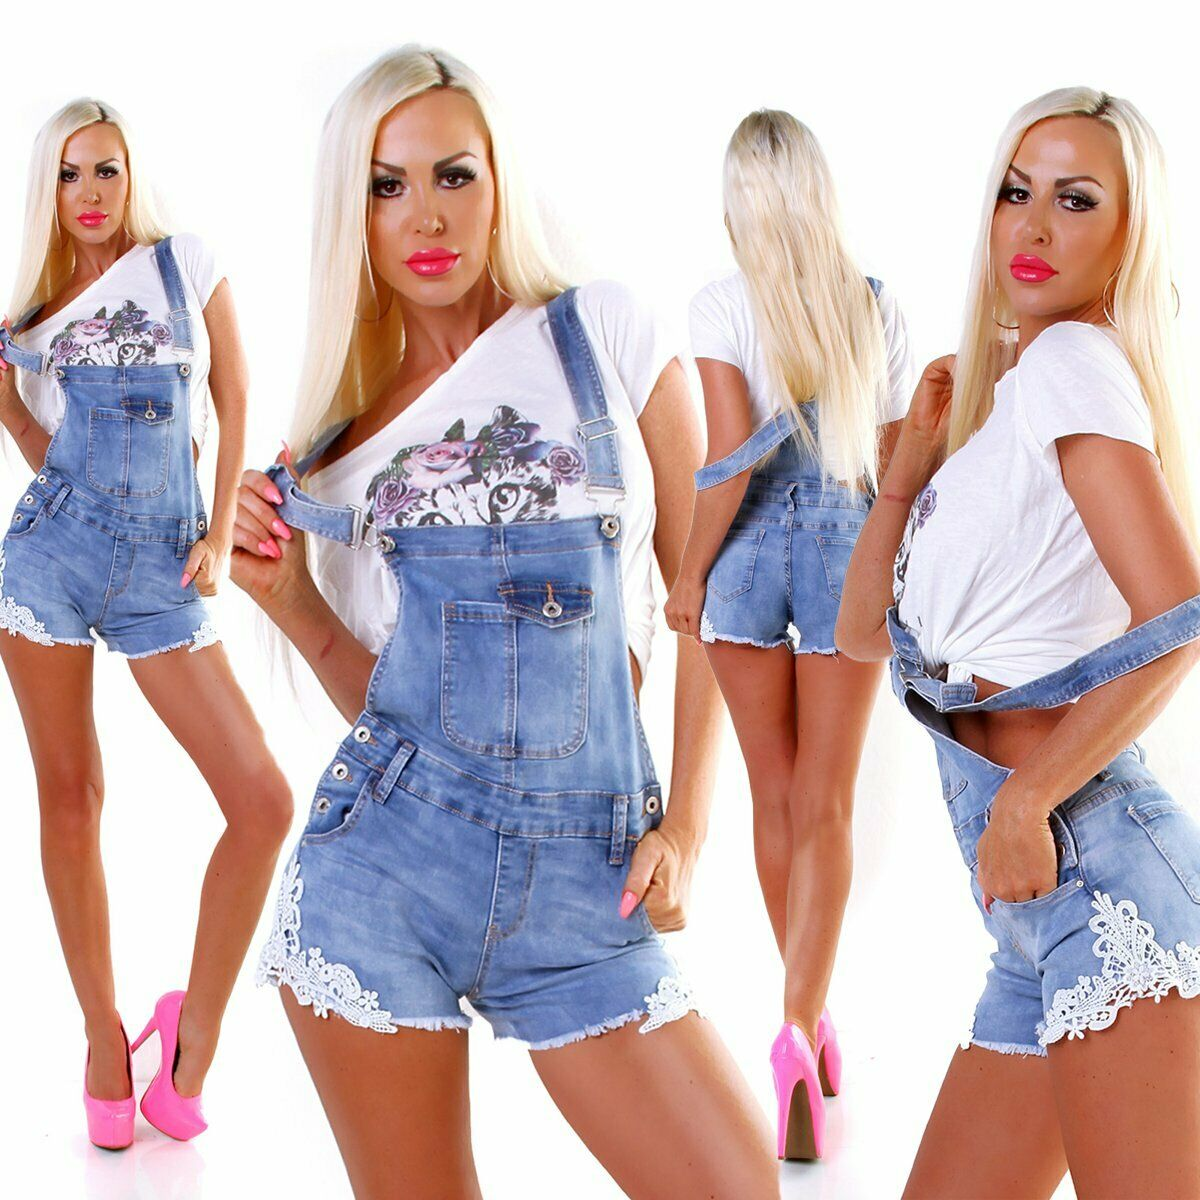 5392 Damen Latzjeans Latzshorts Hotpants Jeans Shorts kurze Hose Spitze Fransen